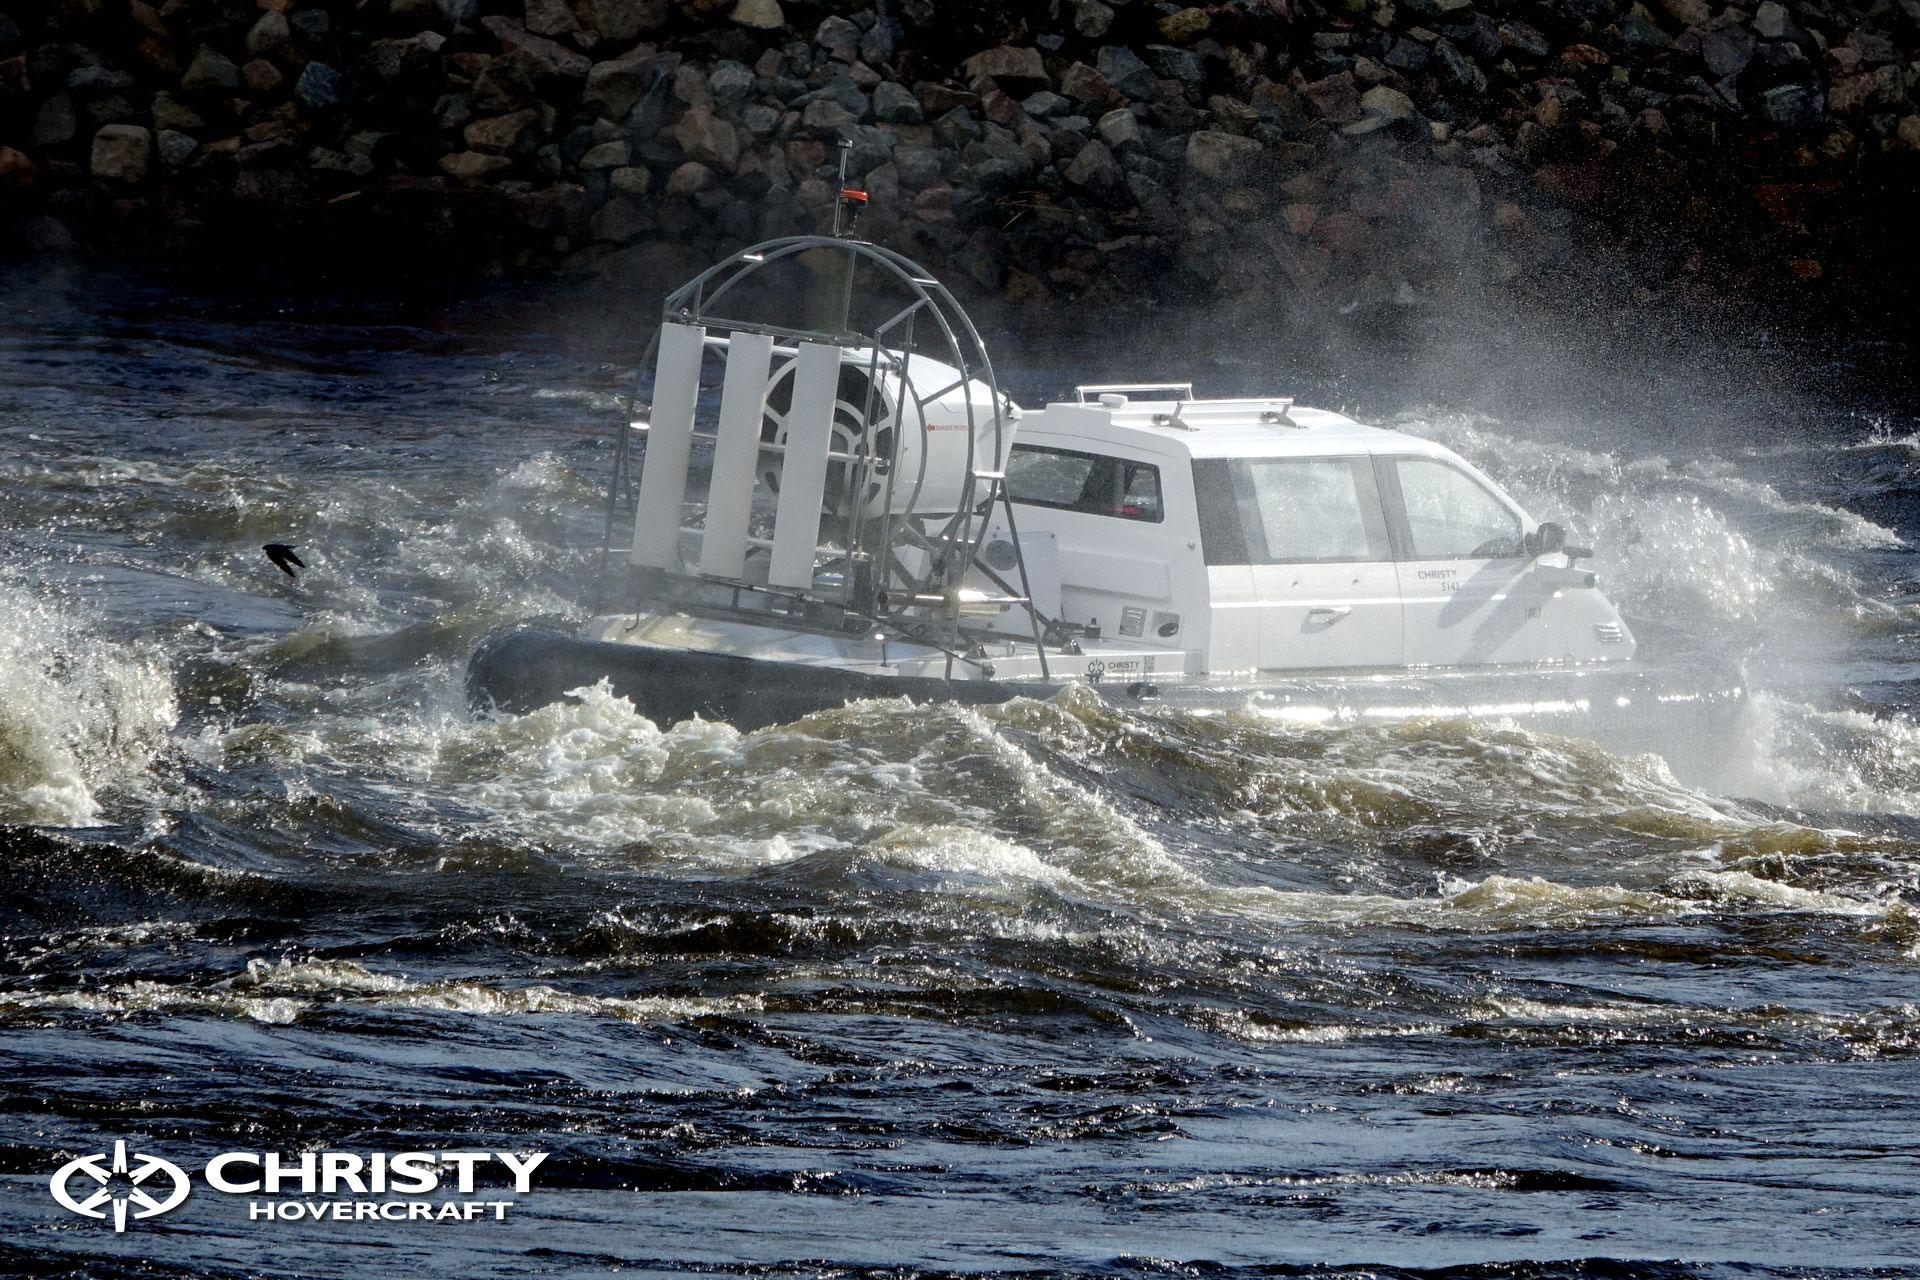 Hovercraft-Christy-5146-FC-20.jpg | фото №18